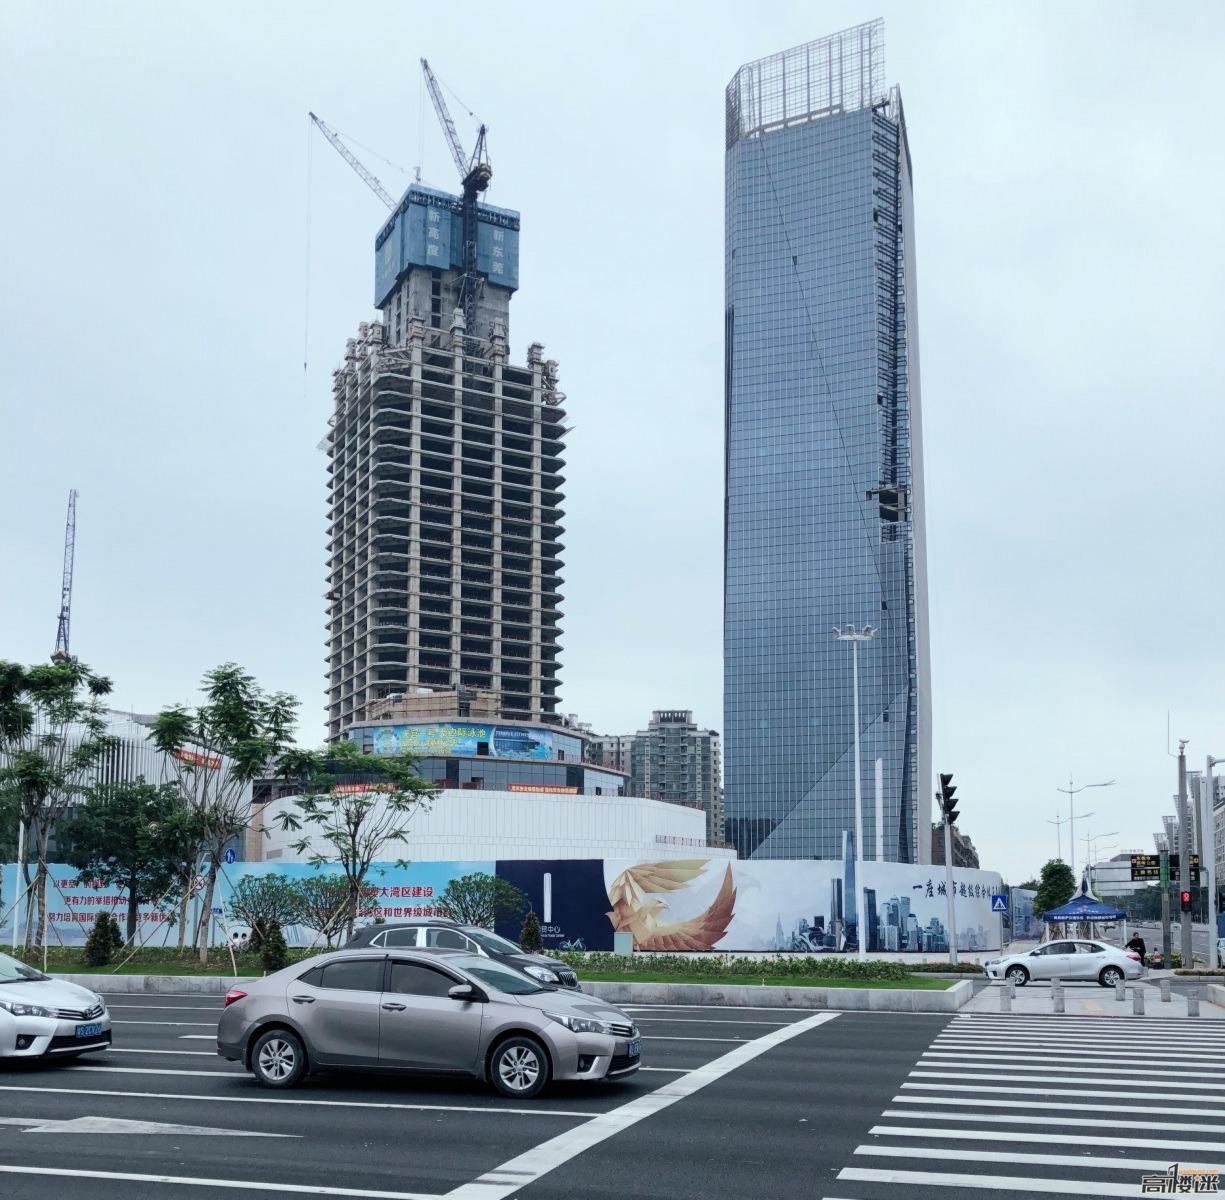 Dongguan International Trade Center Nears Completion